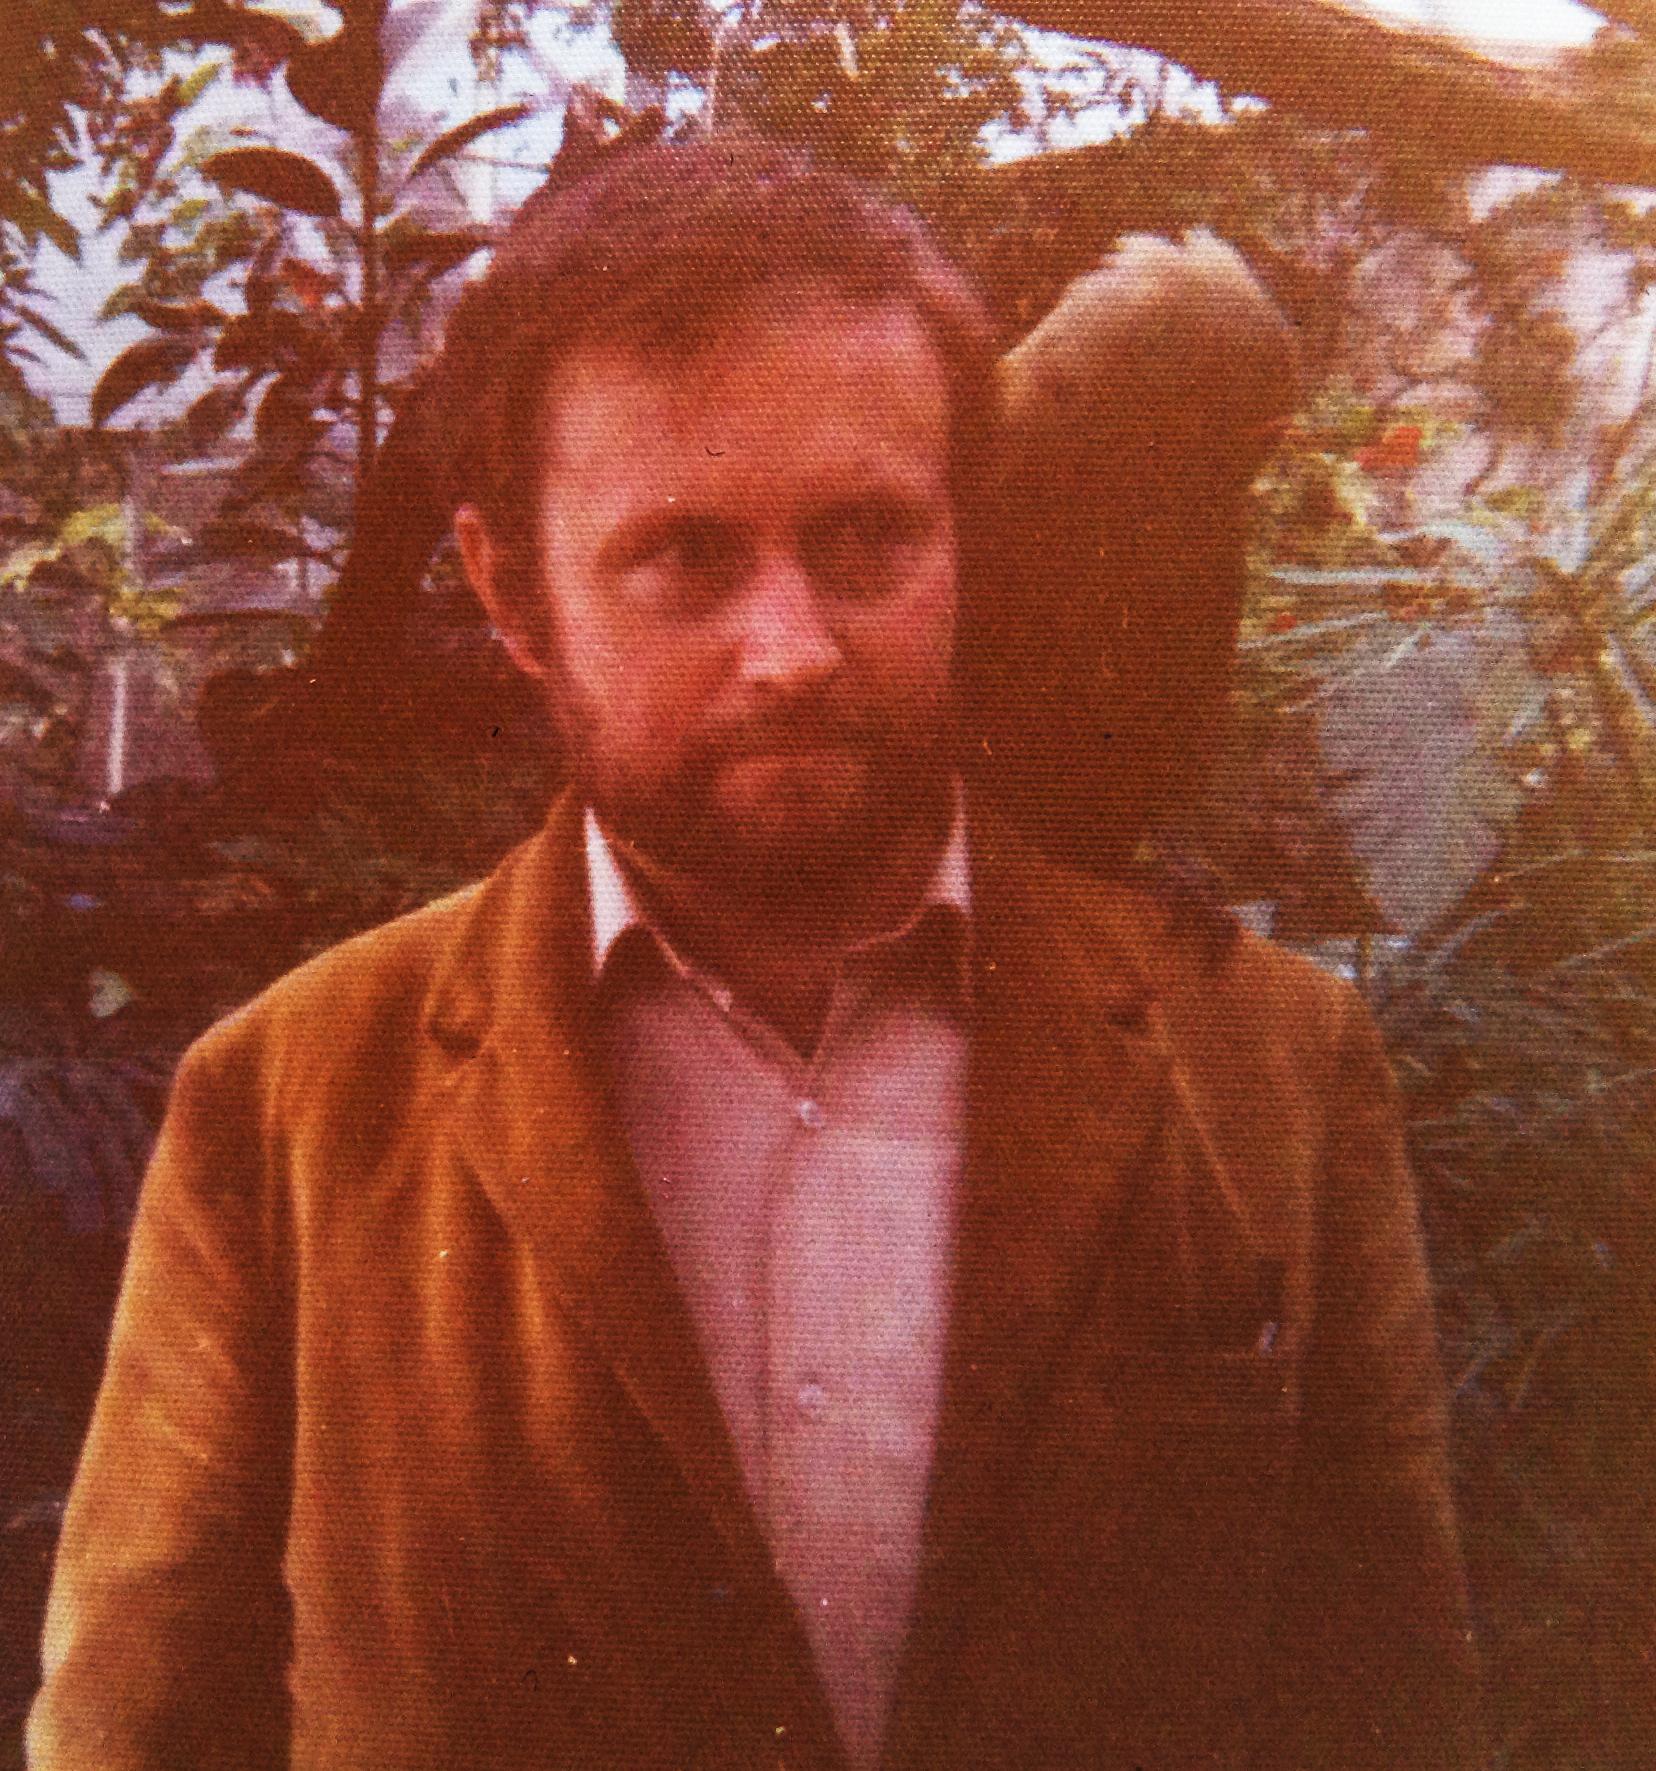 John and Parrot - 1978